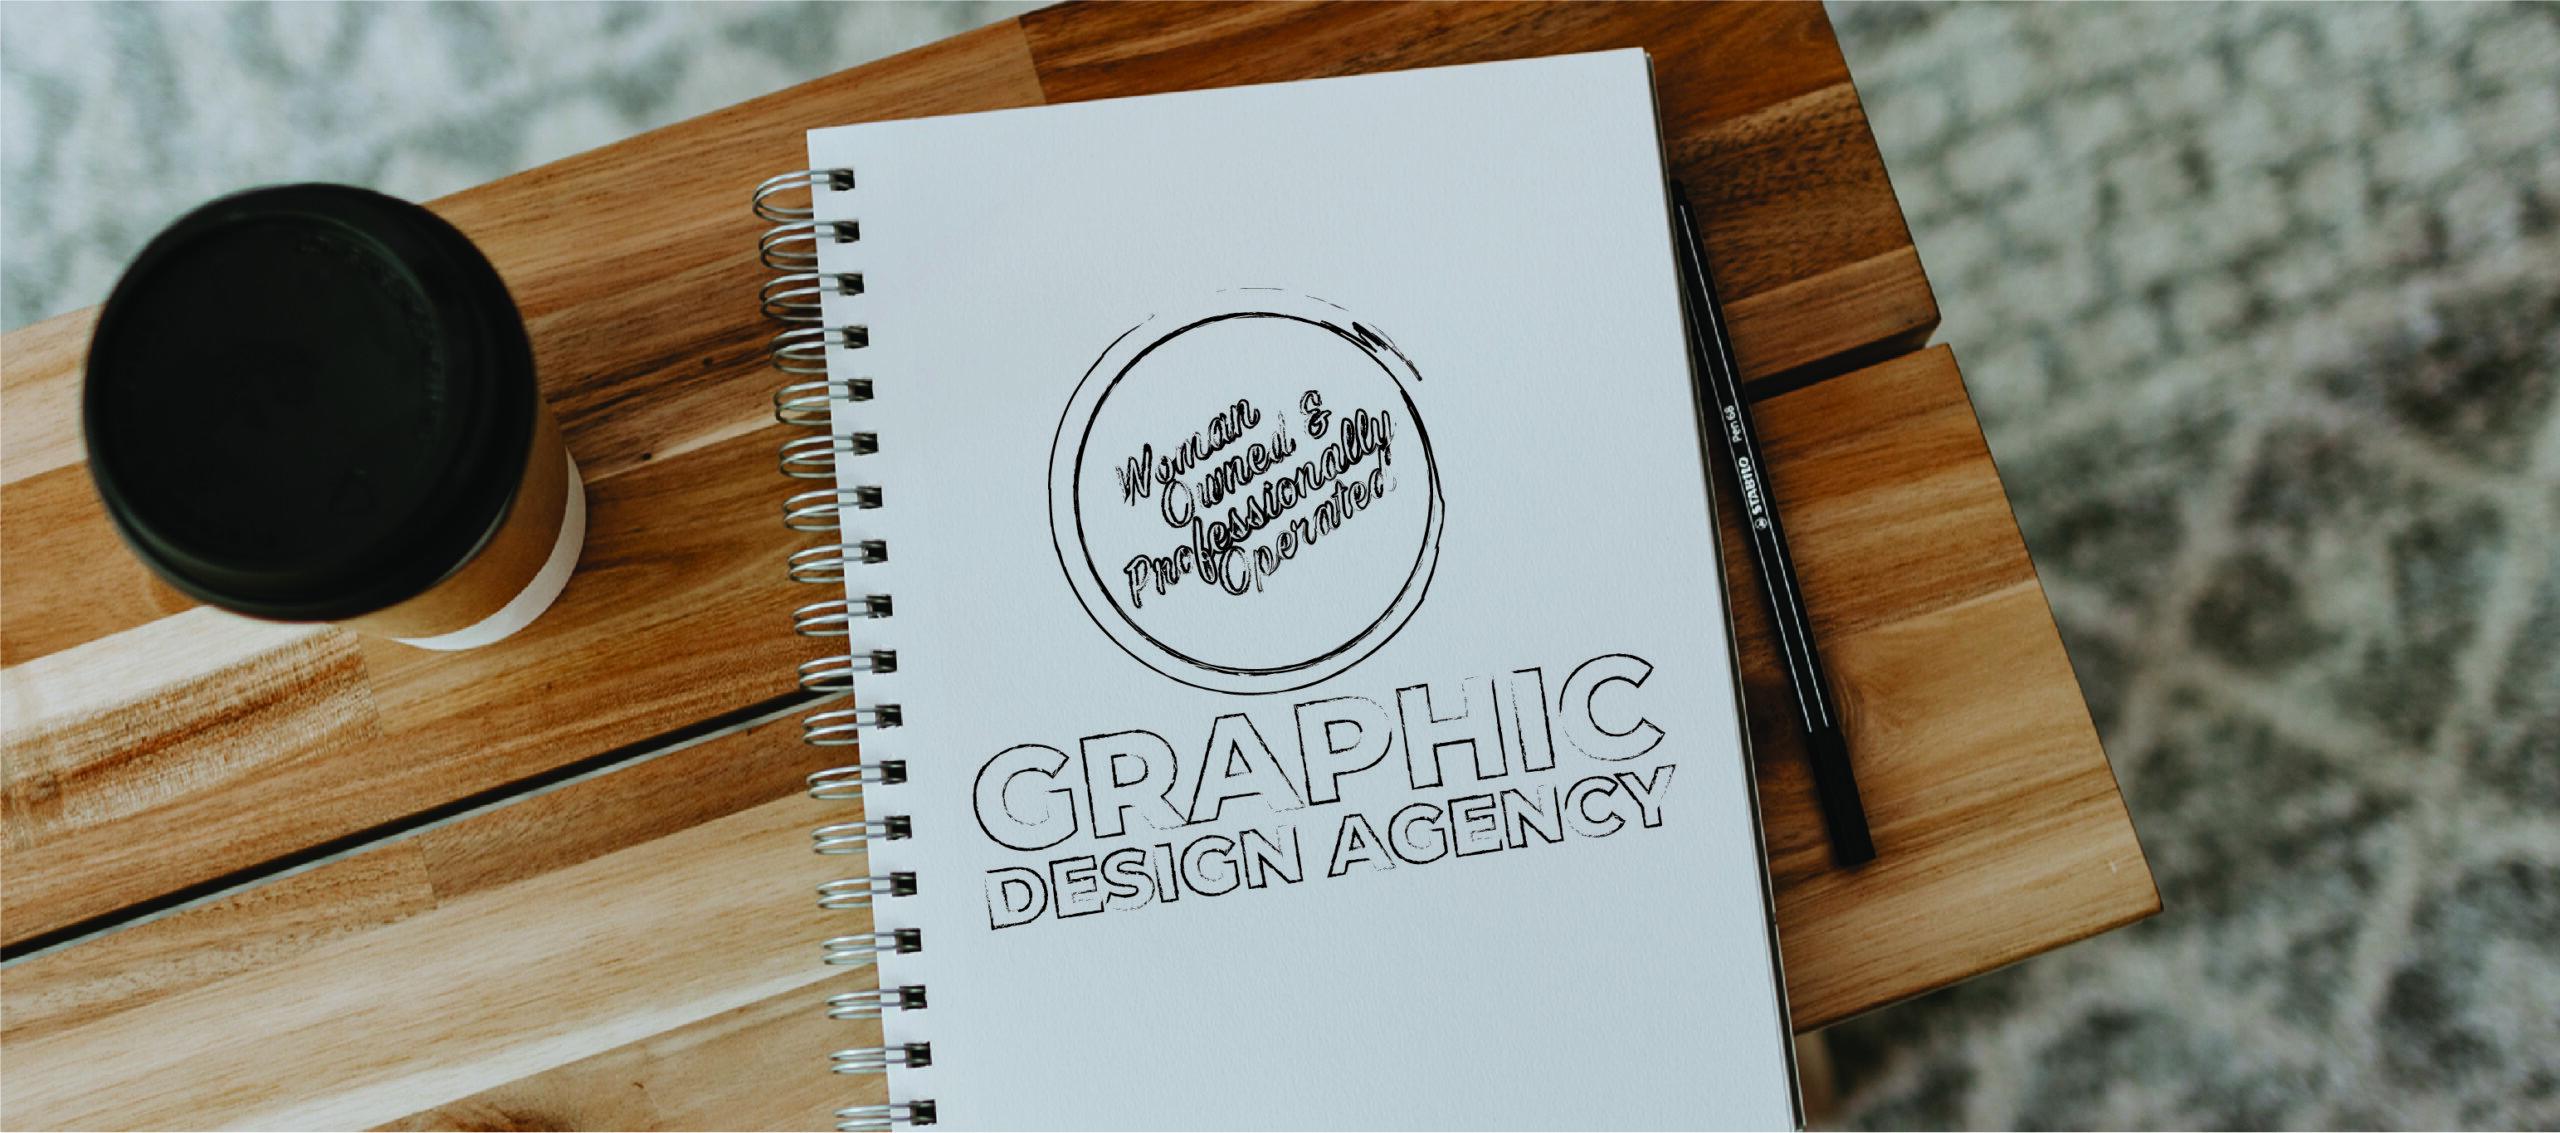 graphic designers survival kit